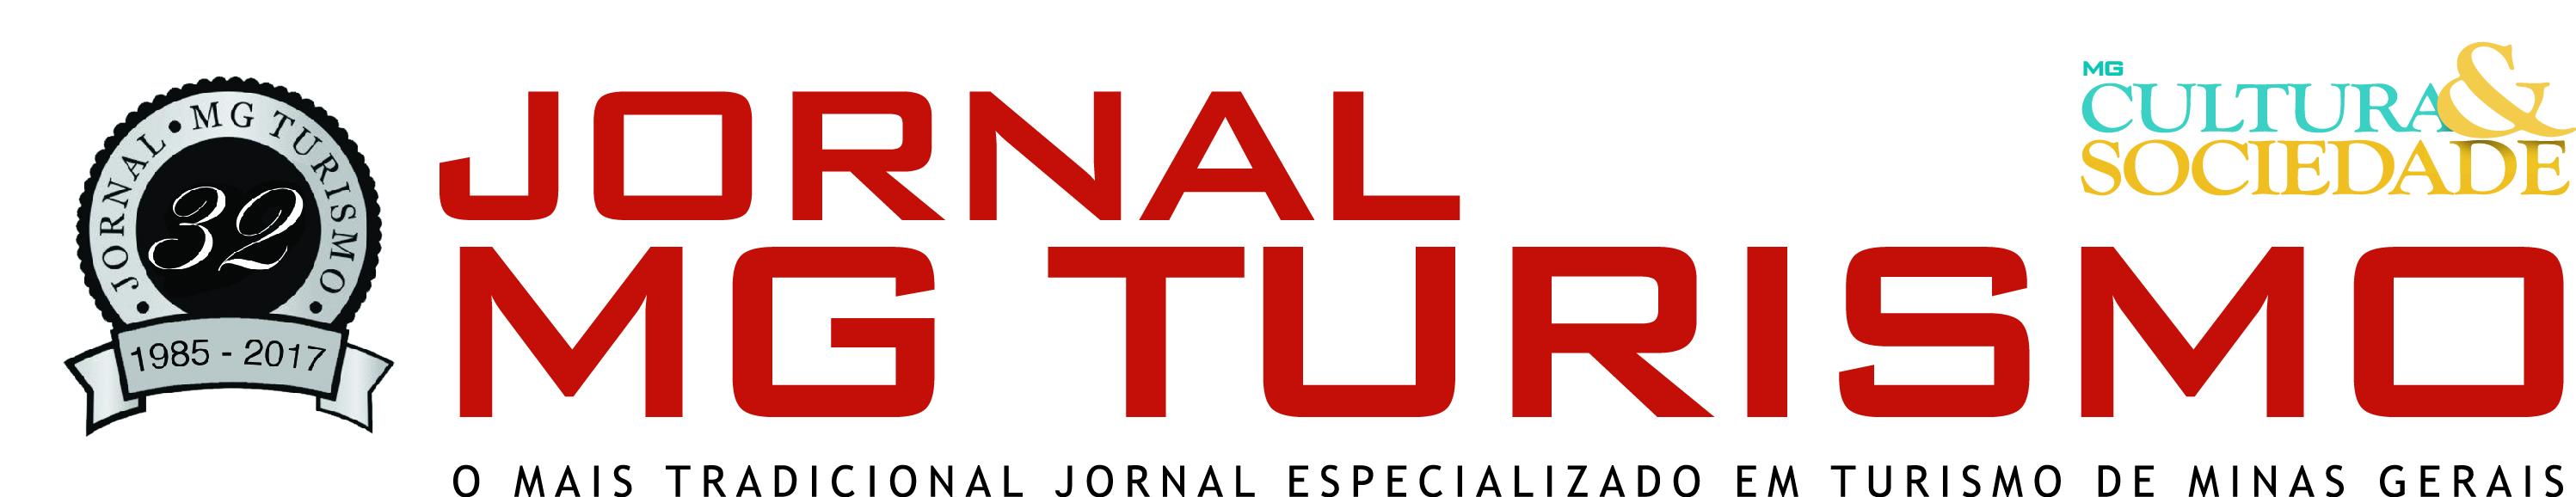 Jornal MG Turismo.jpg